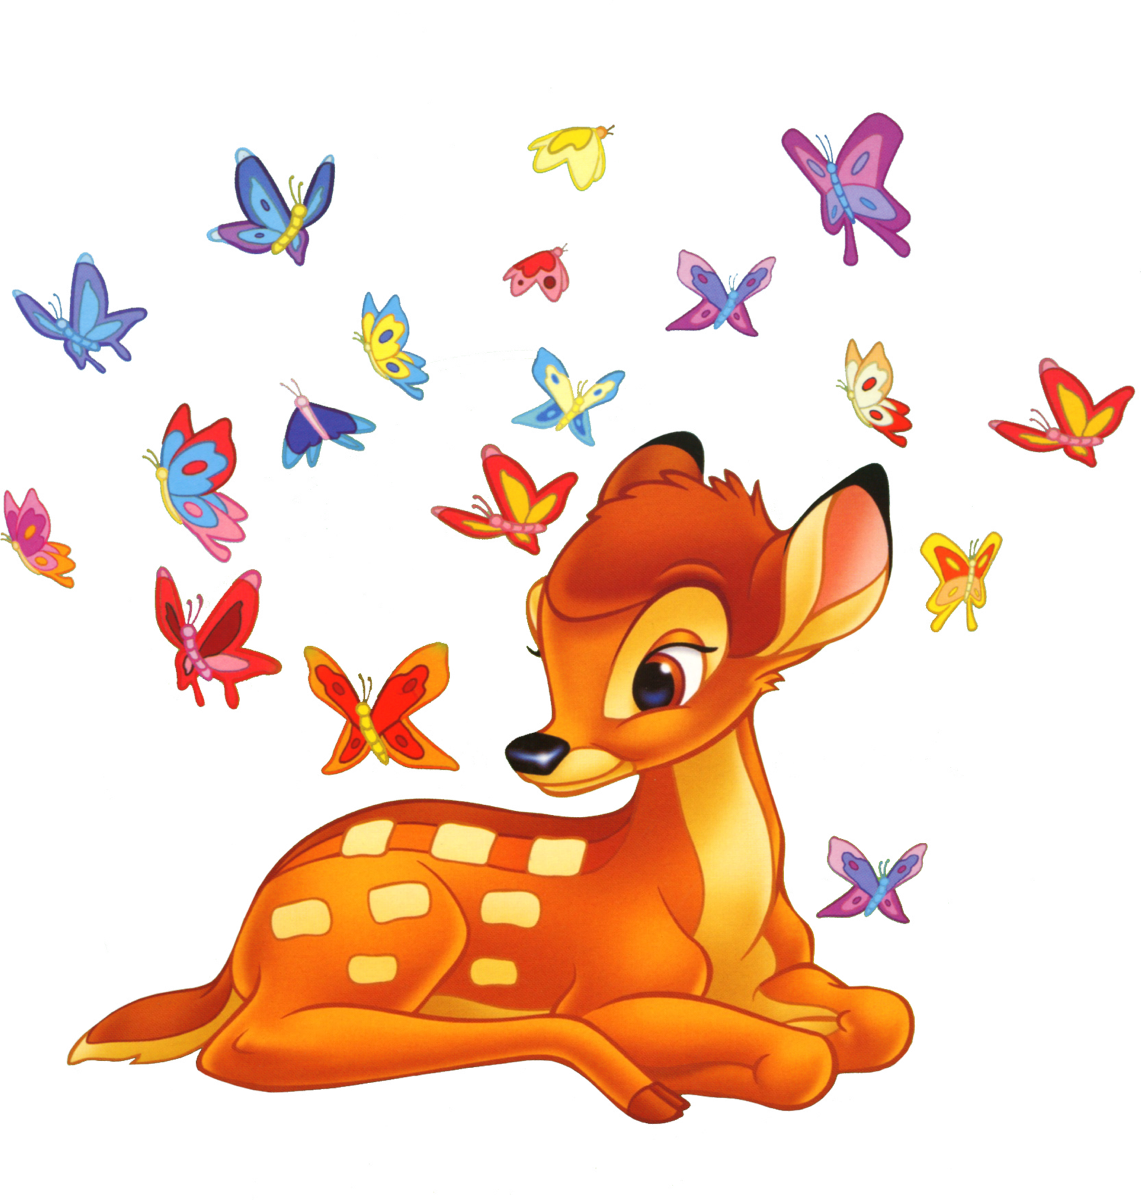 bambi para imprimir imagenes y dibujos para imprimir walt disney clipart images walt disney clipart free